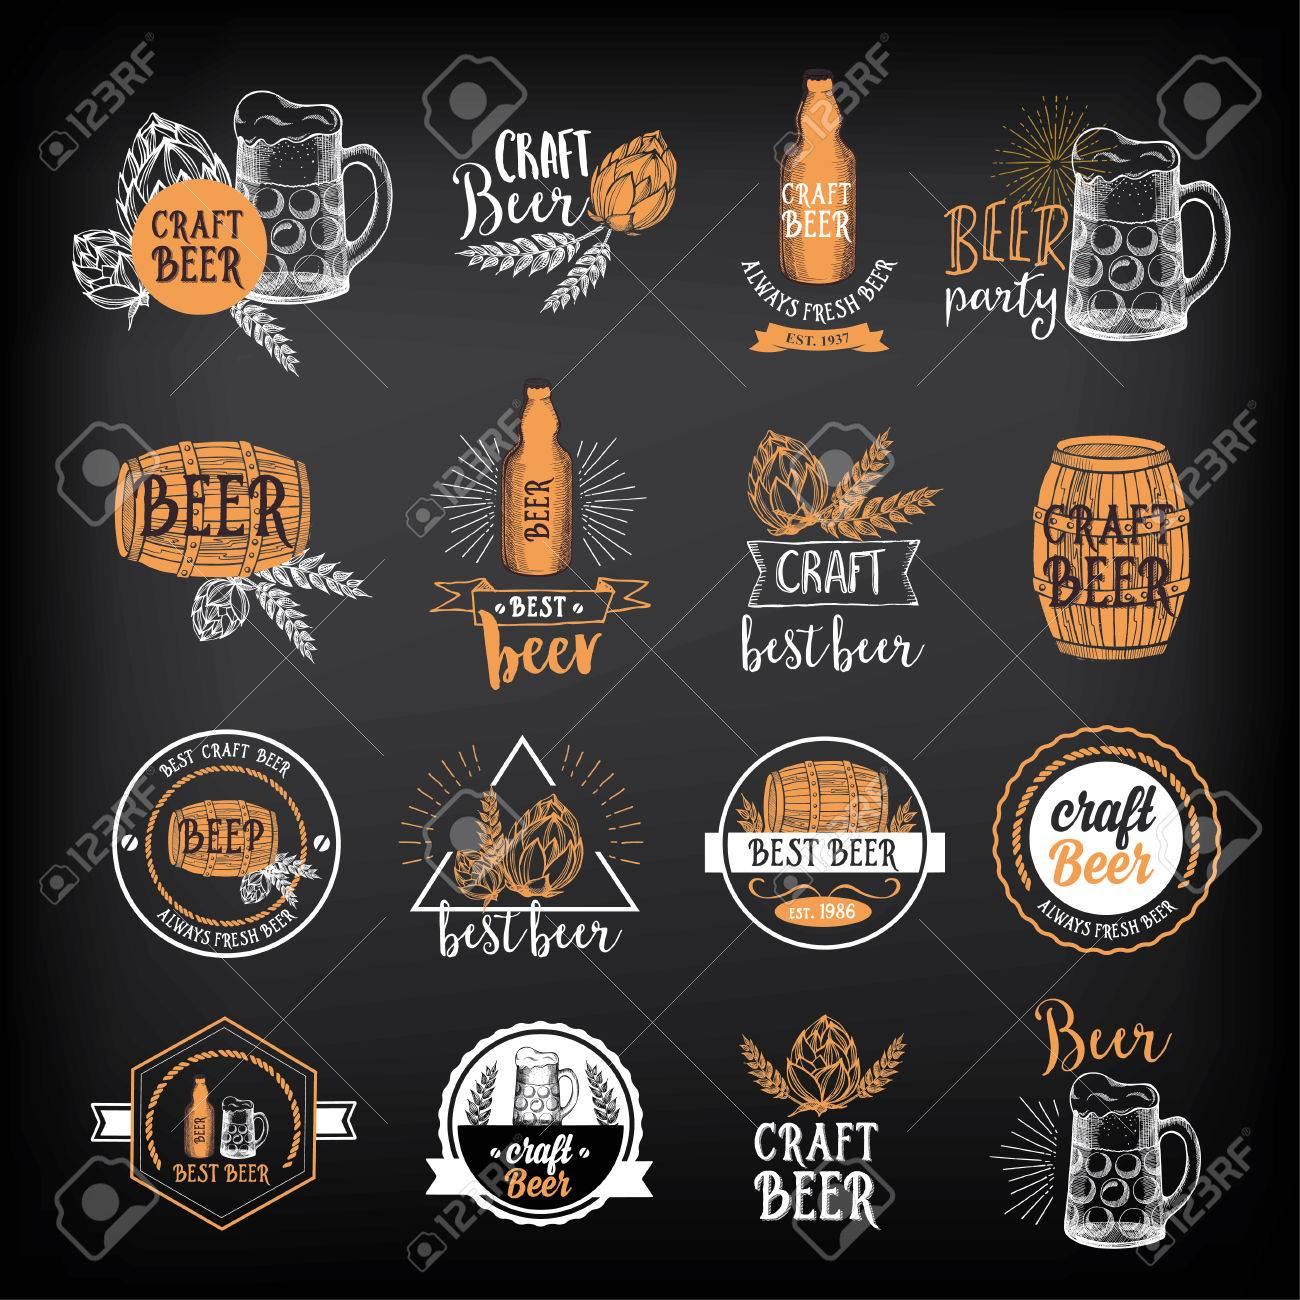 Beer restaurant badges vector, alcohol menu design. - 53222313